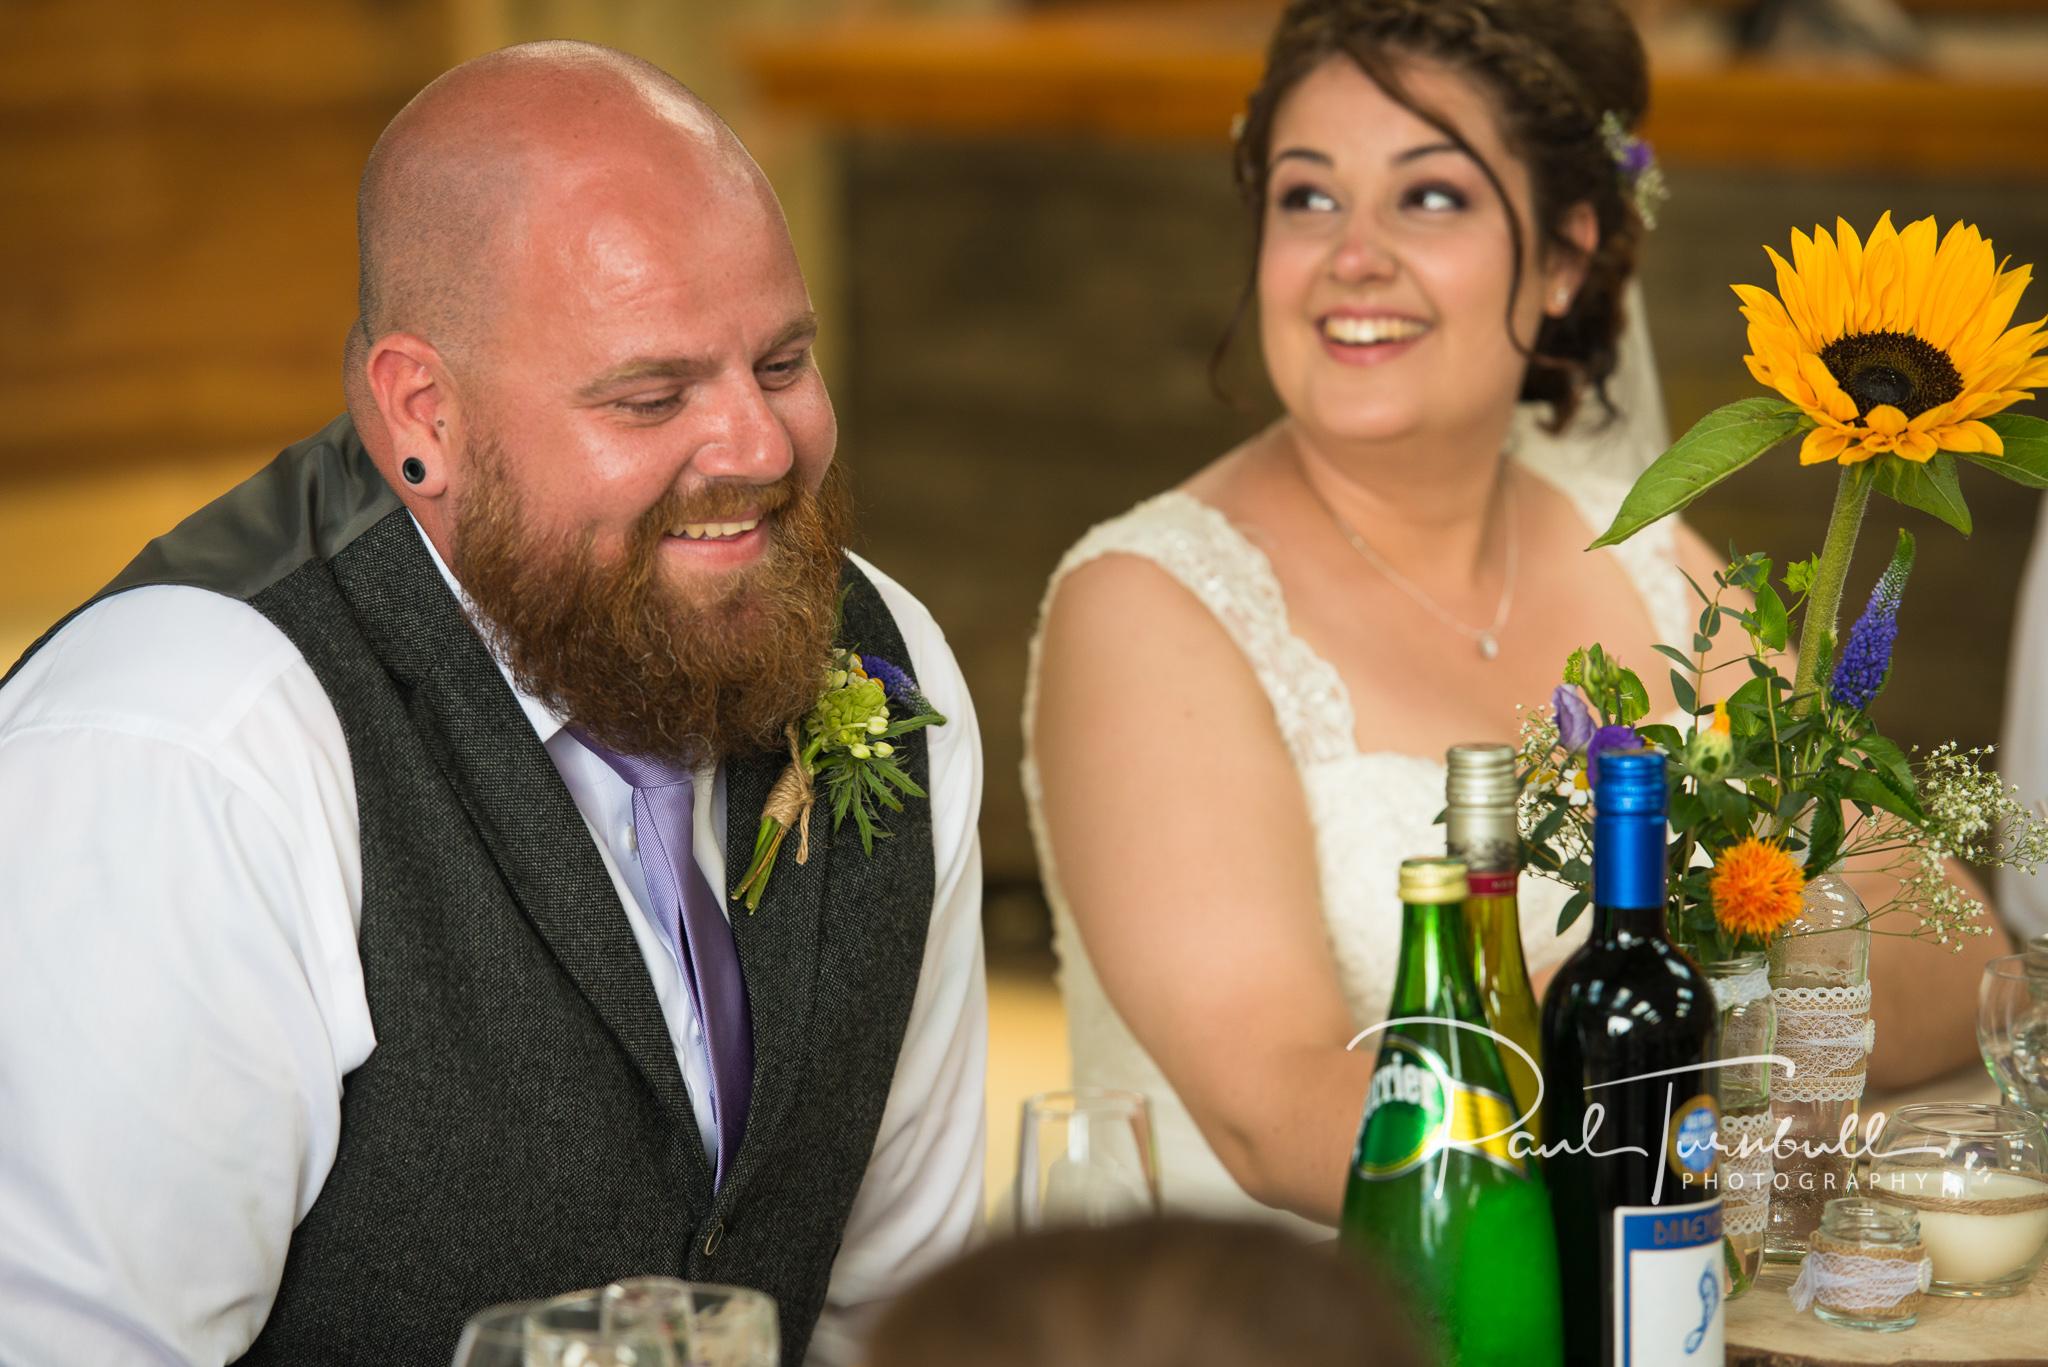 wedding-photographer-hilltop-farm-ilton-yorkshire-047.jpg